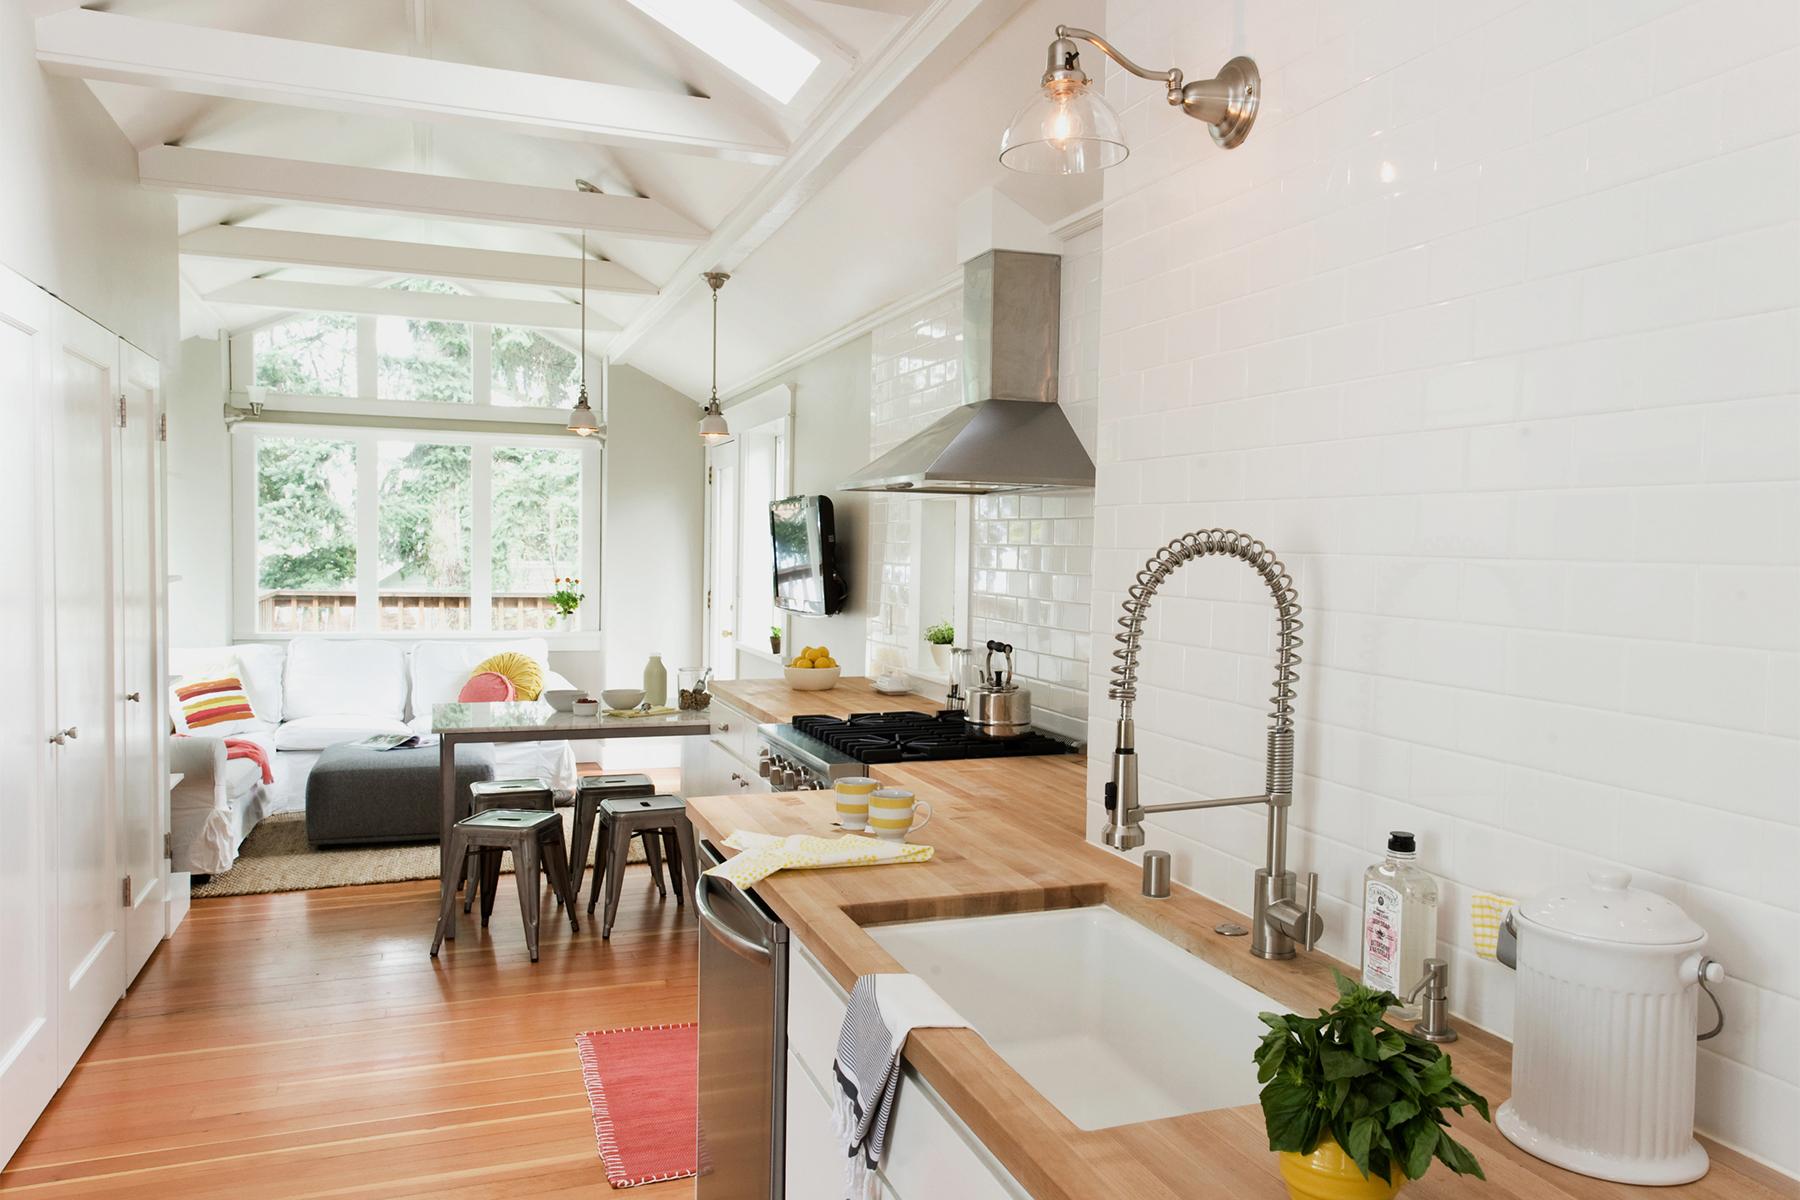 Open Bright Kitchen with Living Space & Butcher Block Countertops | Casework Interior Design | Portland, OR